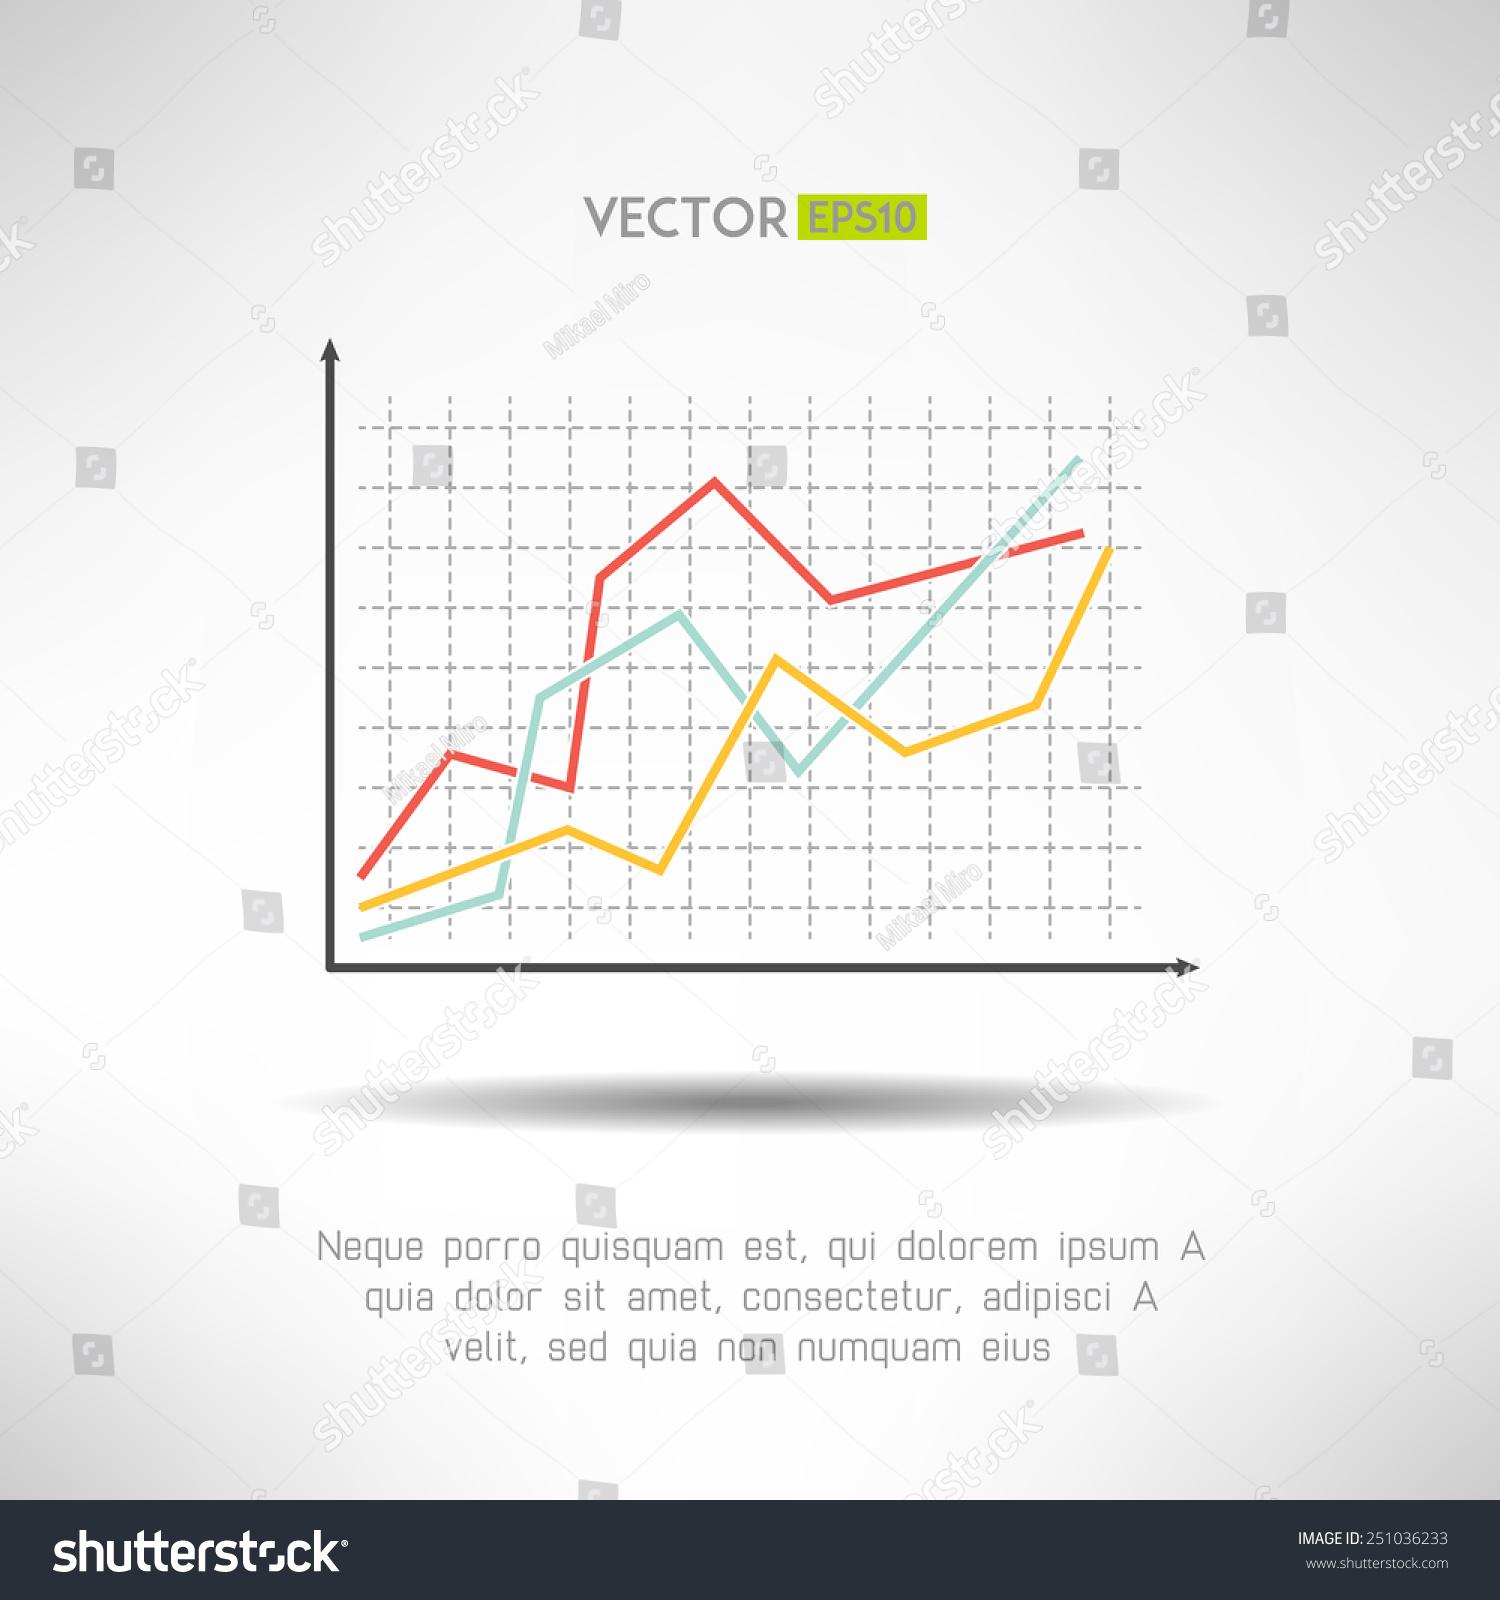 economic finance graphics chart icon market stock vector royalty